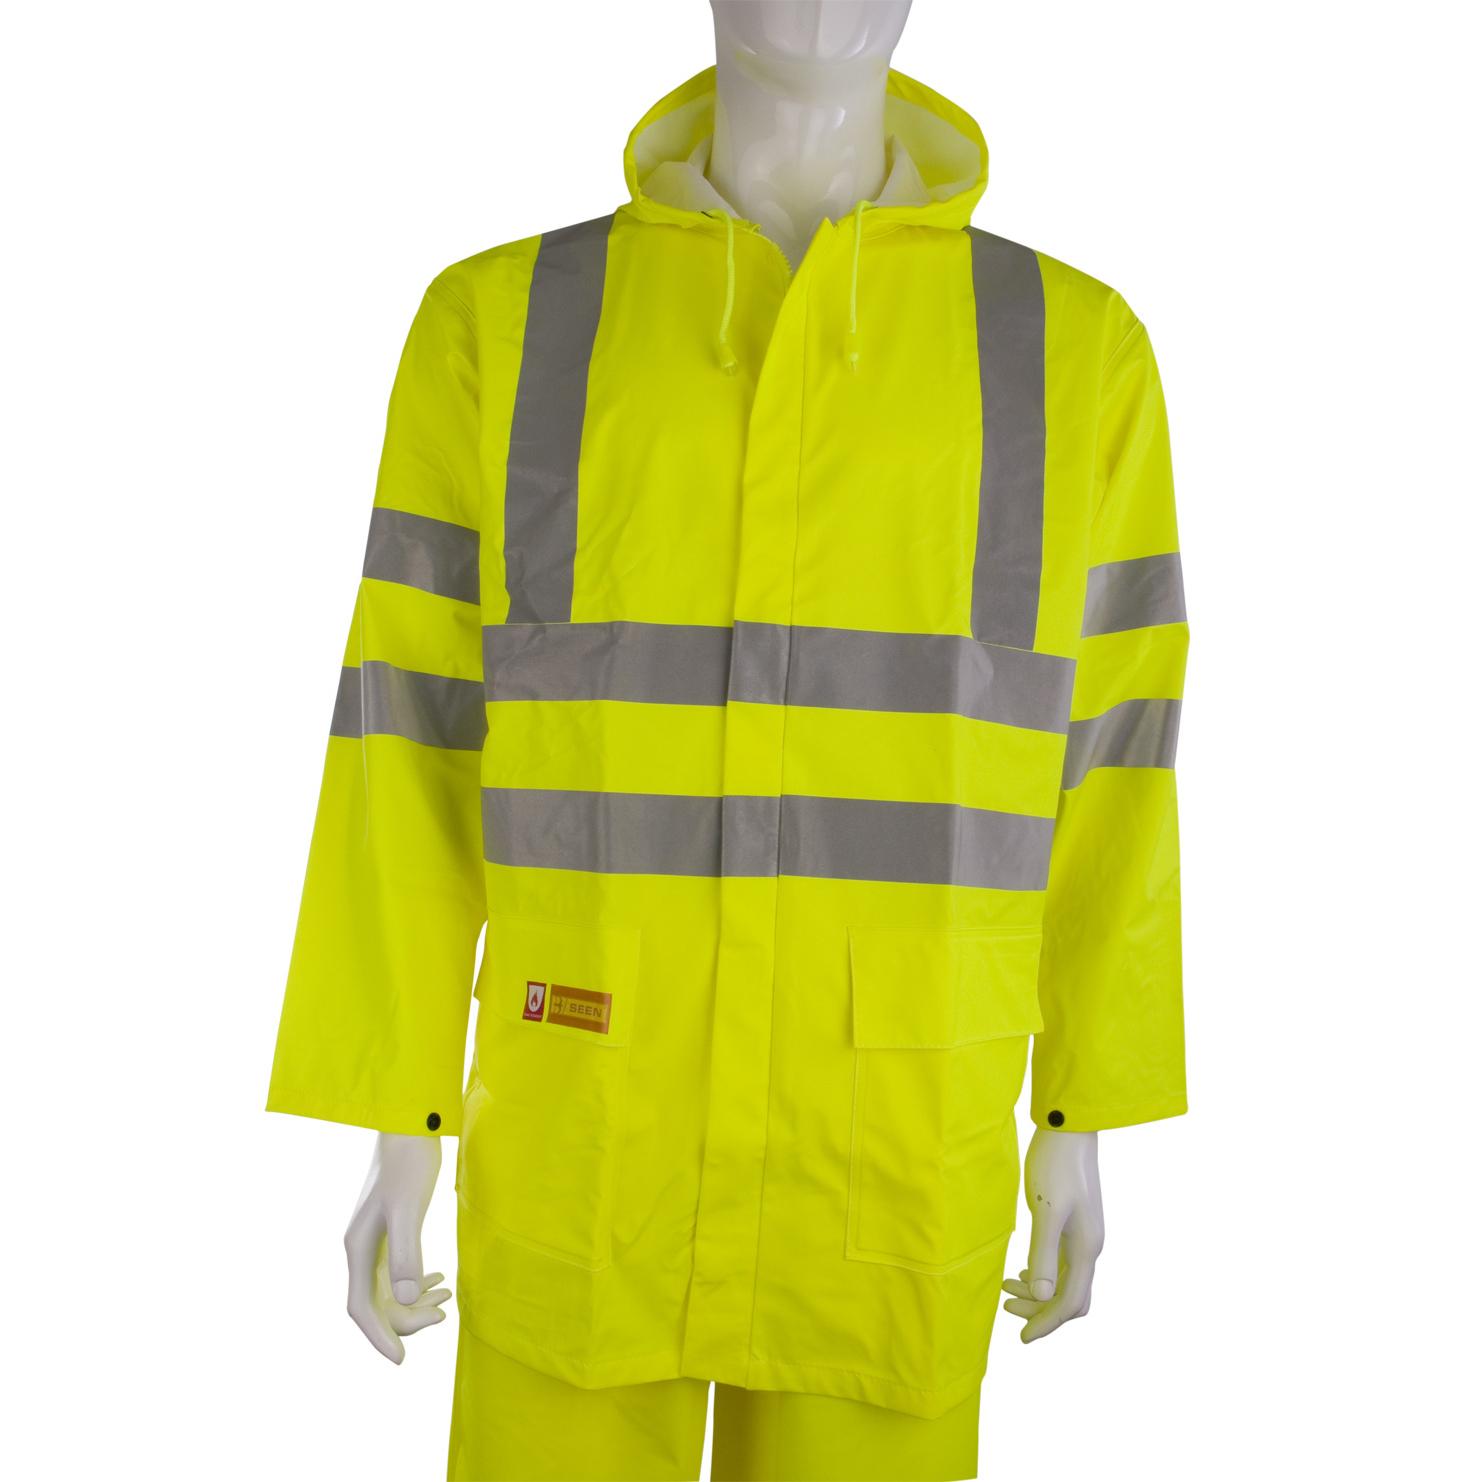 Weatherproof B-Seen Fire Retardant Jacket Anti-static 4XL Sat Yellow Ref CFRLR55SYXXXXL *Up to 3 Day Leadtime*